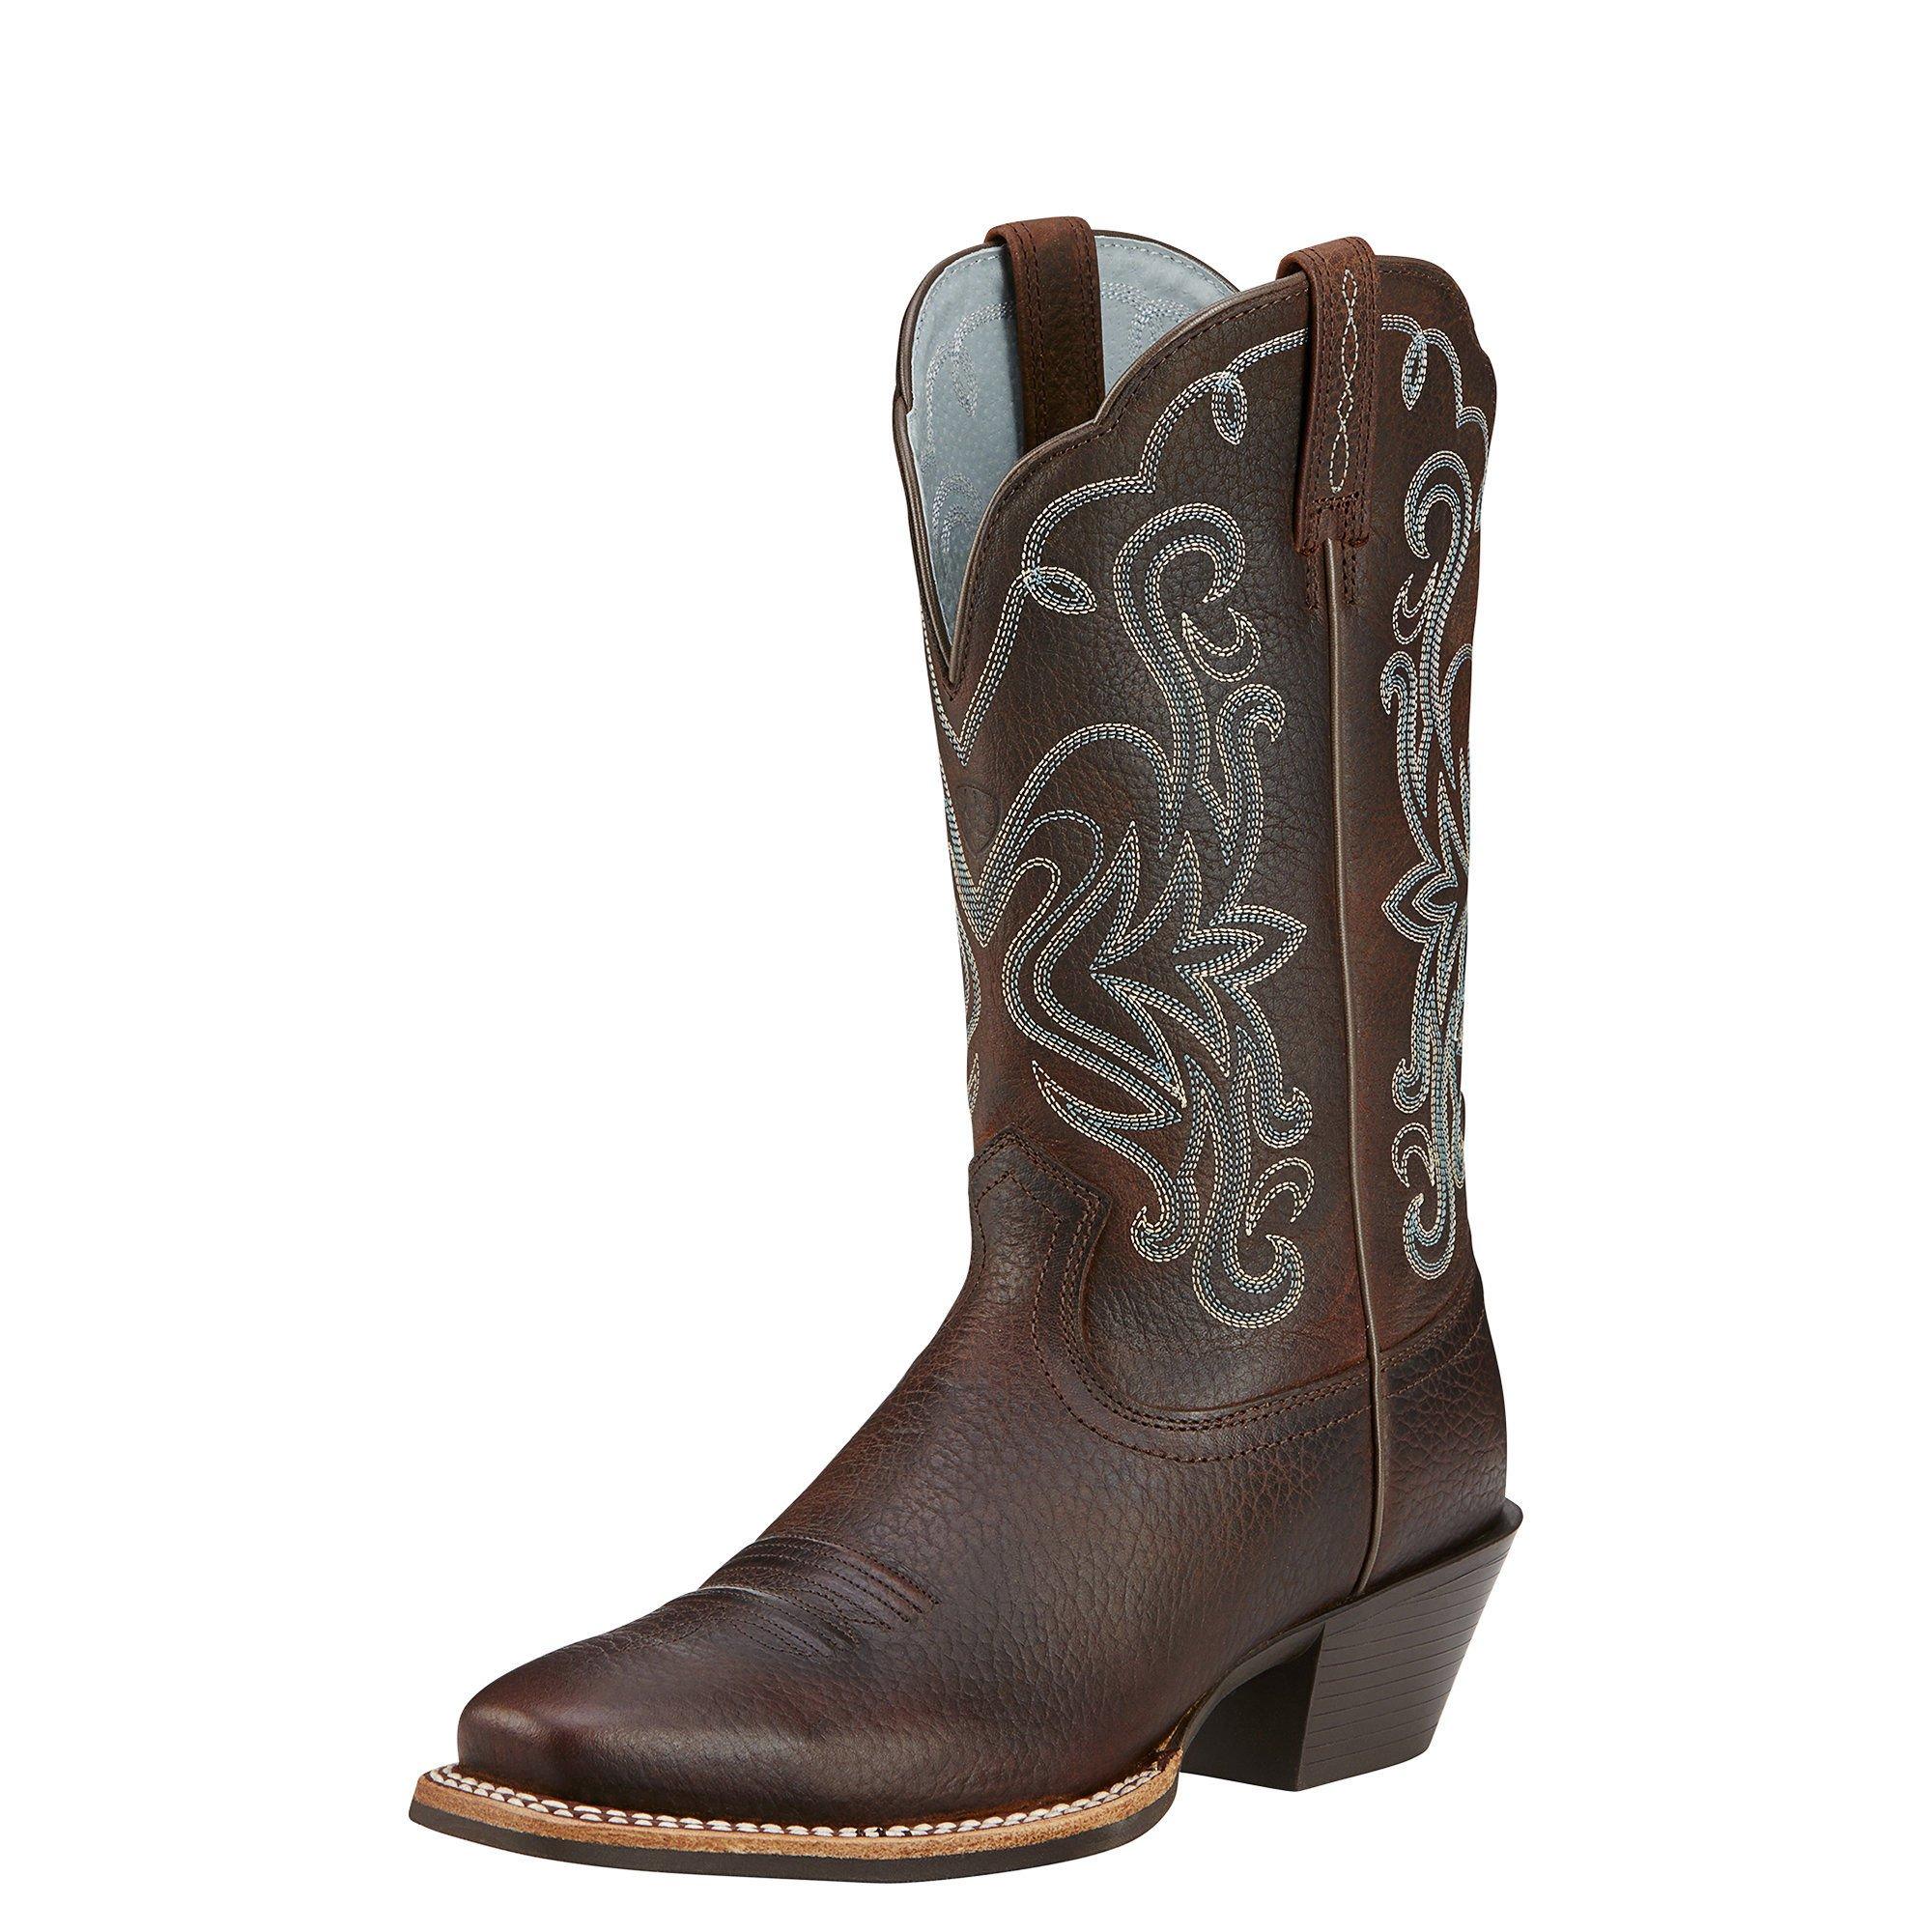 Ariat Women's Legend Western Cowboy Boot, Brown Oiled Rowdy, 9 B US